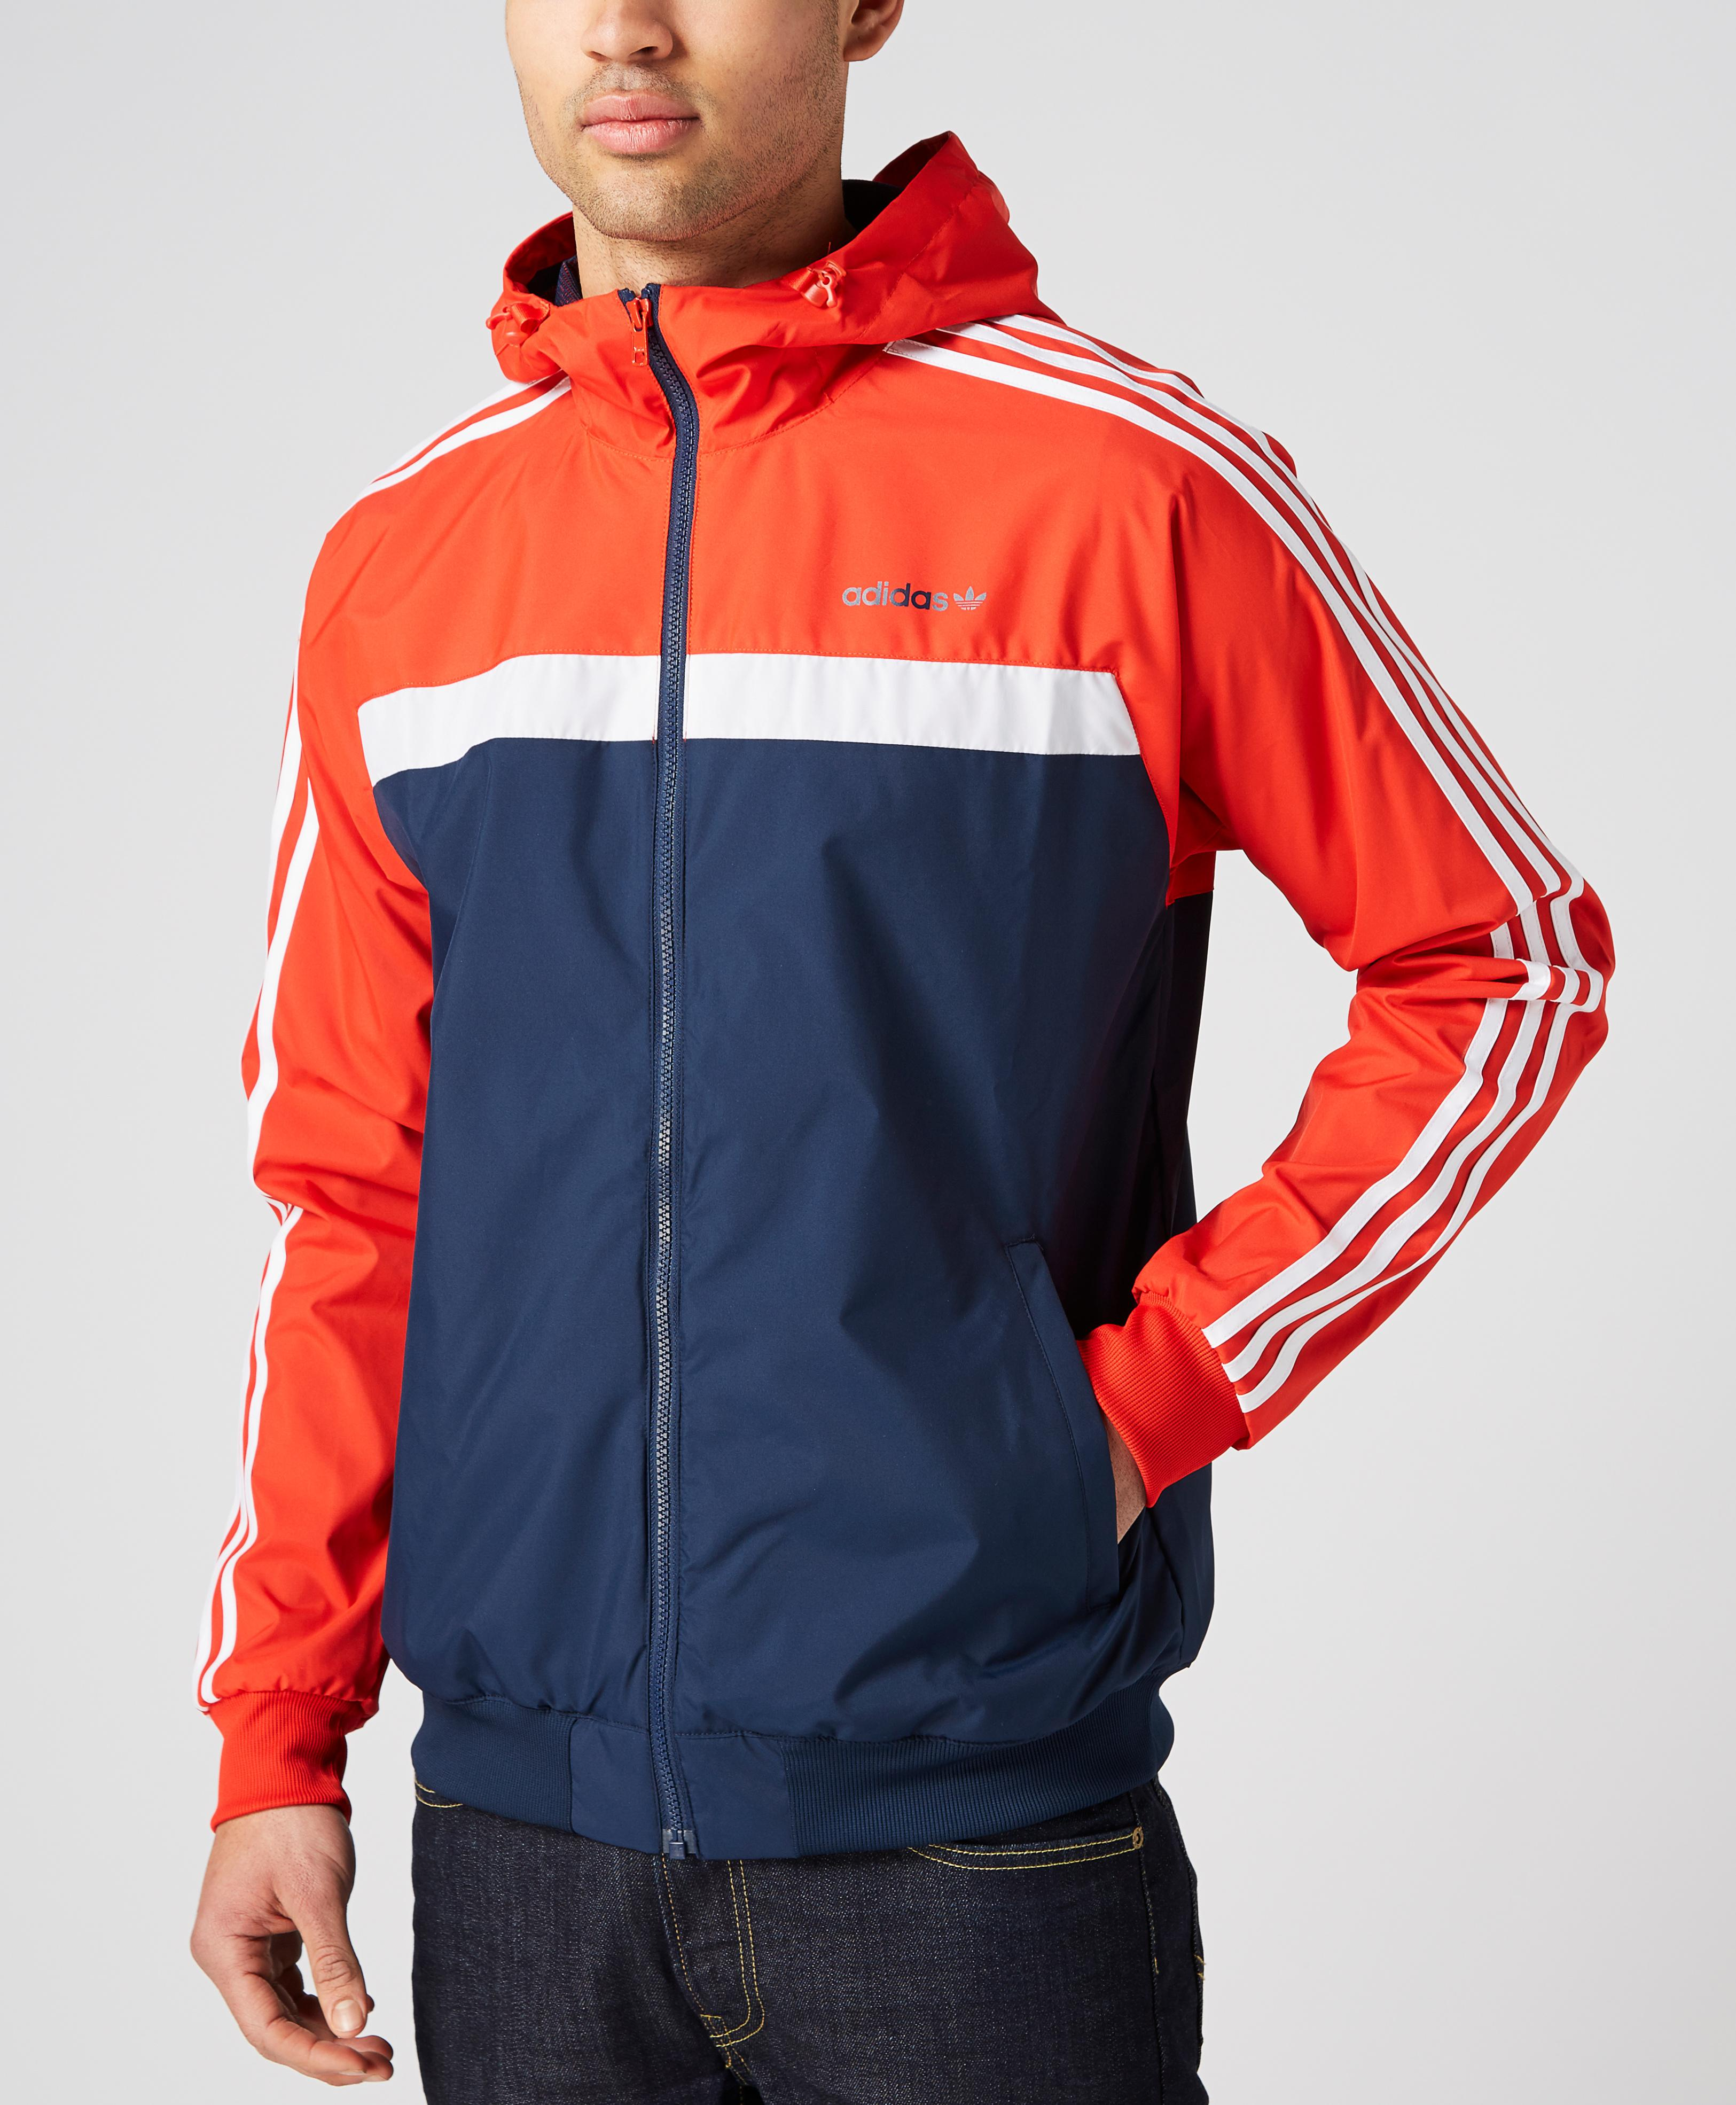 adidas marathon 83 jacket